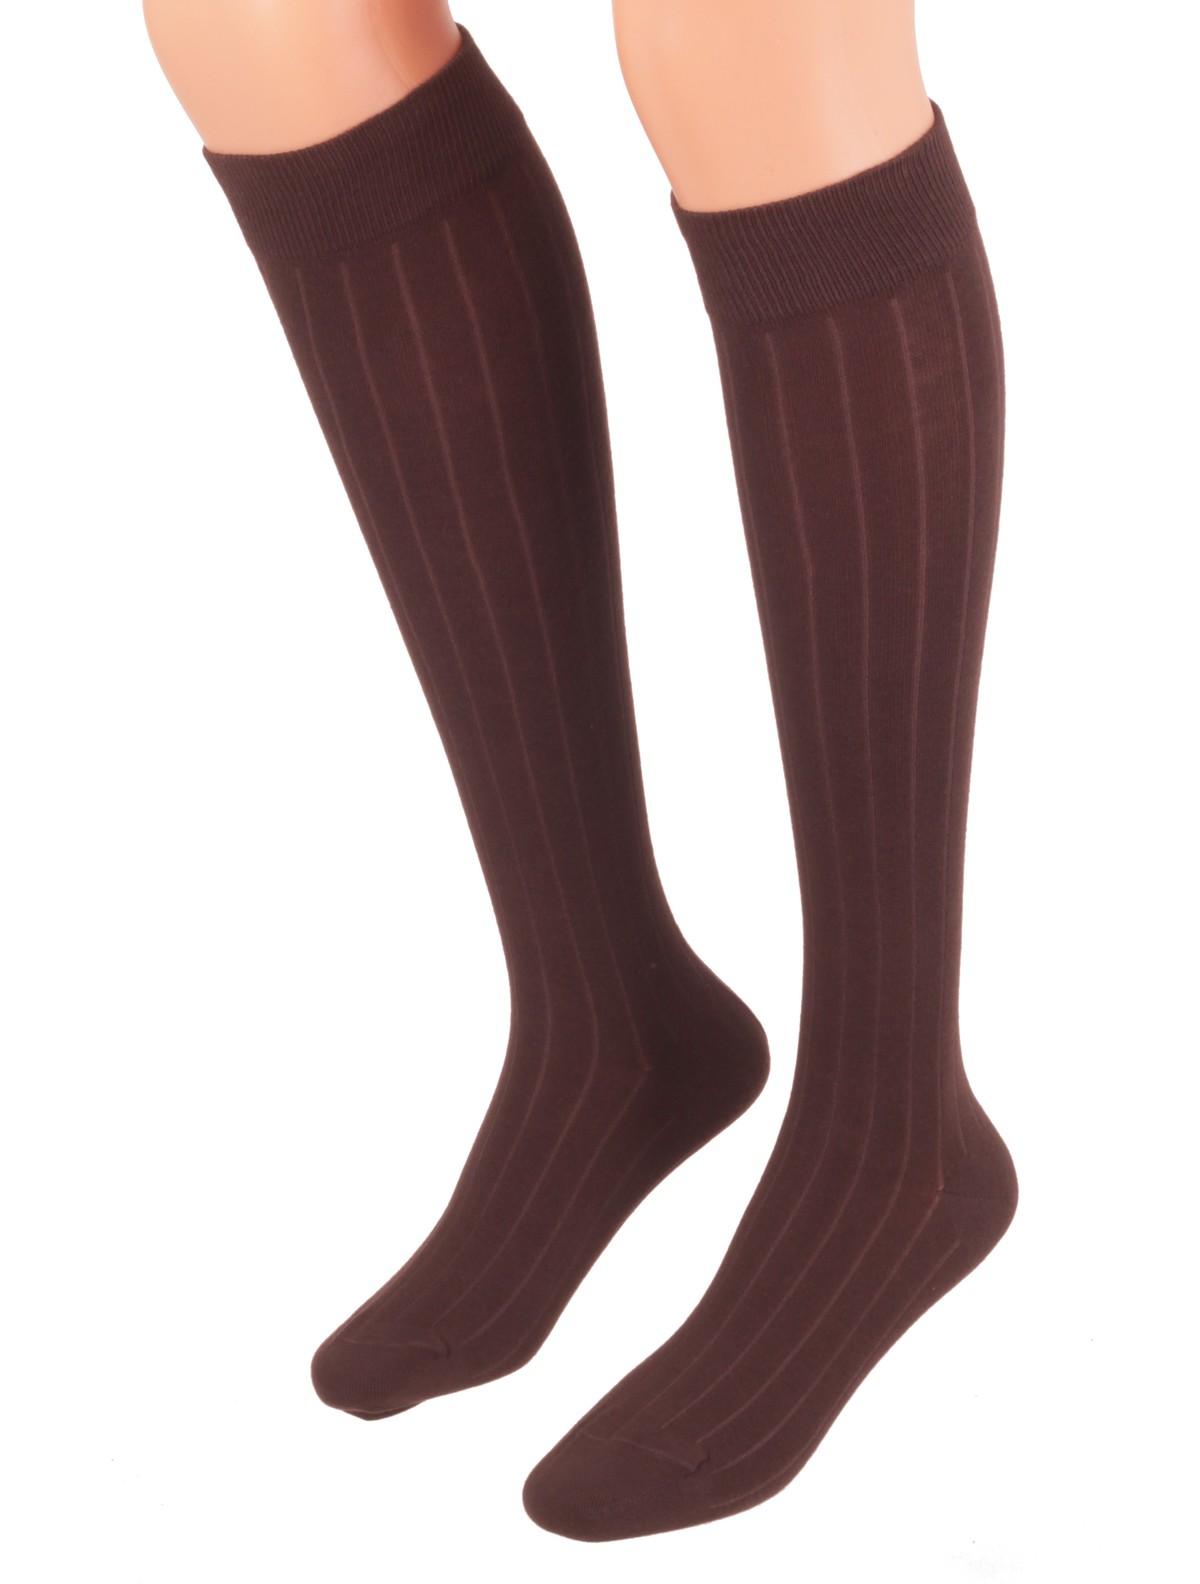 4717ce20d ... Bonnie Doon 7x1 Ribbed Knee High Socks dark brown ...